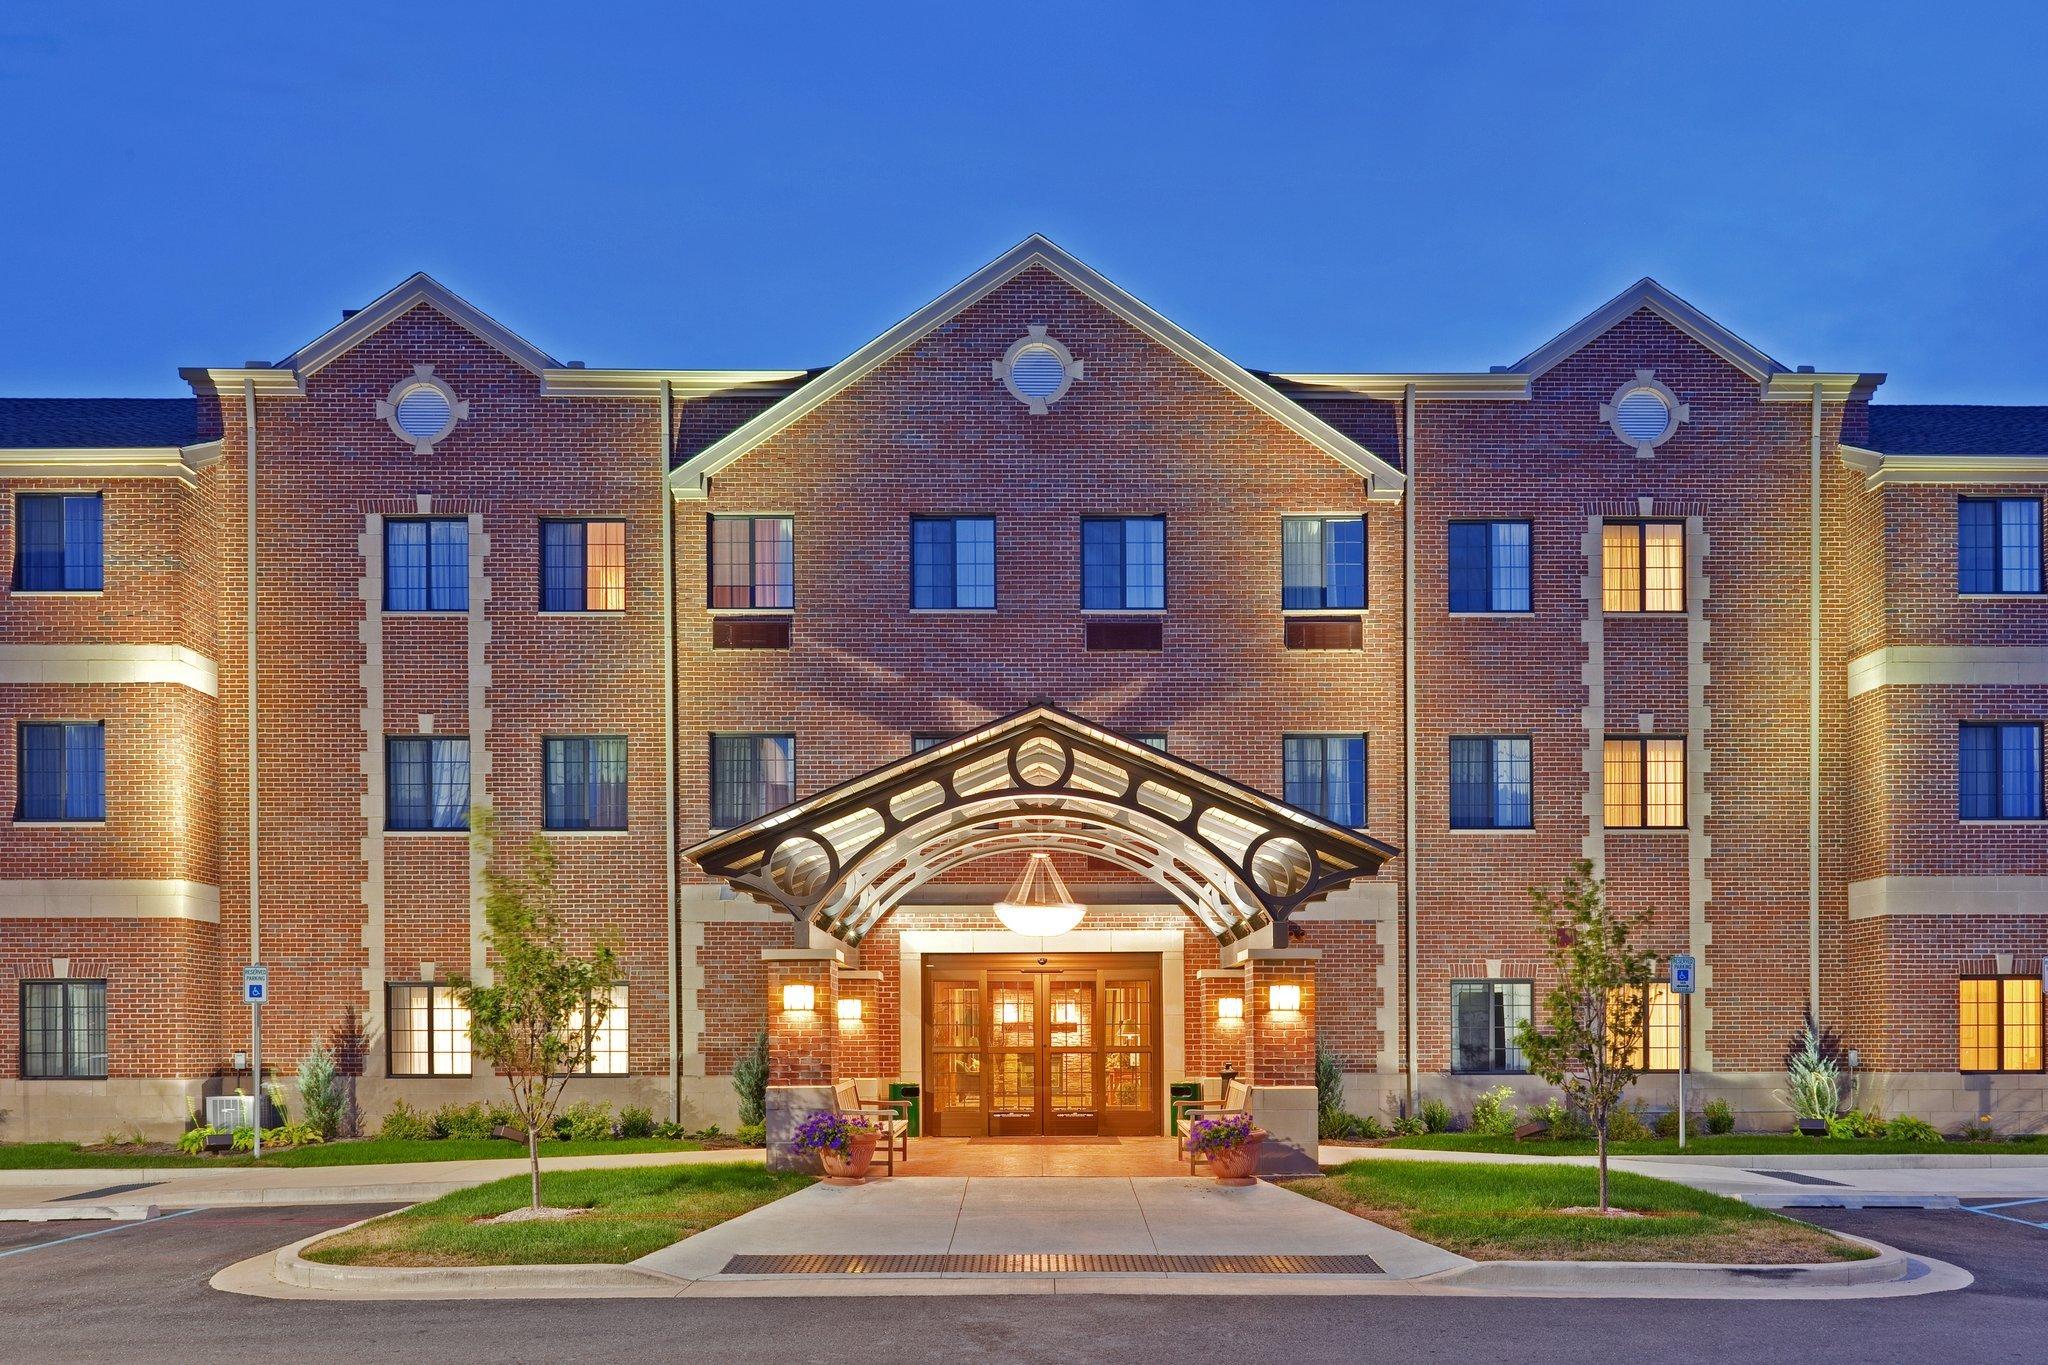 Staybridge Suites Indianapolis - Carmel